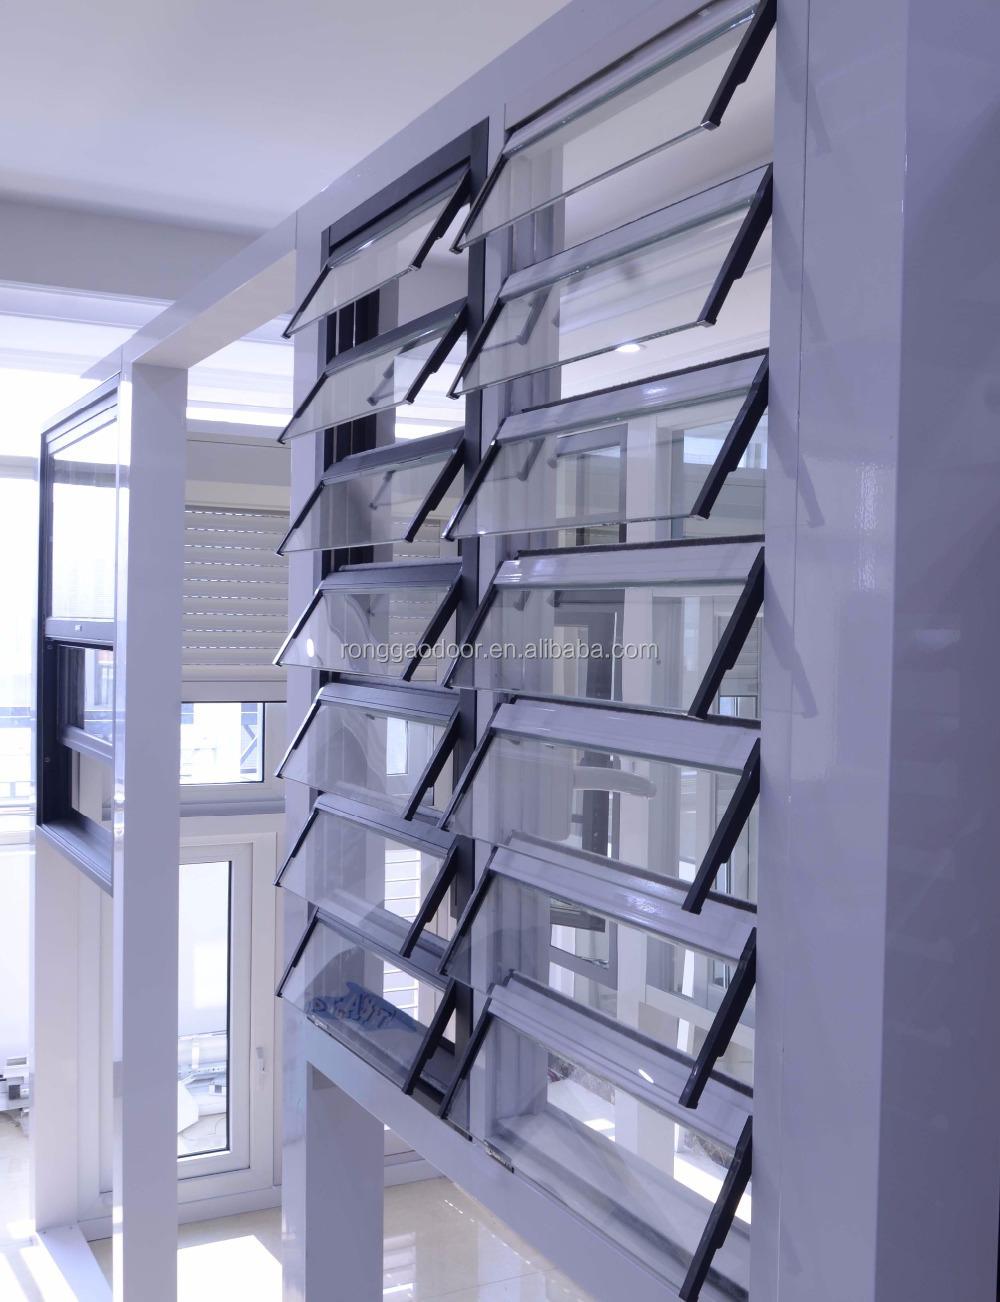 Ventana persiana de aluminio para ba o ventanas - Persiana de aluminio ...